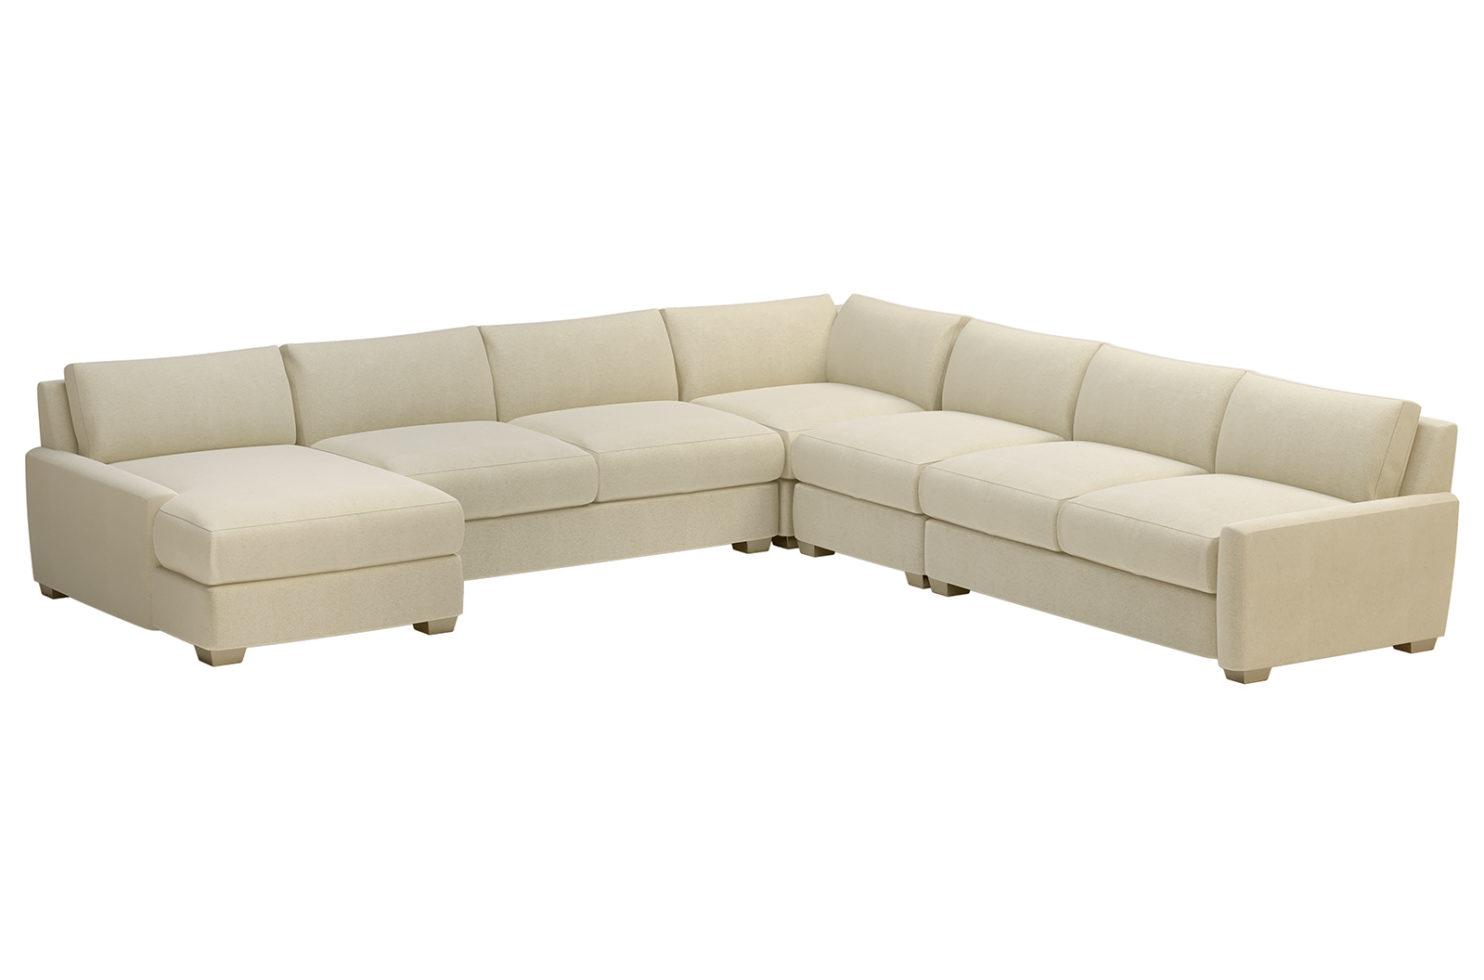 fizz imperial full left chaise 105FT004P2